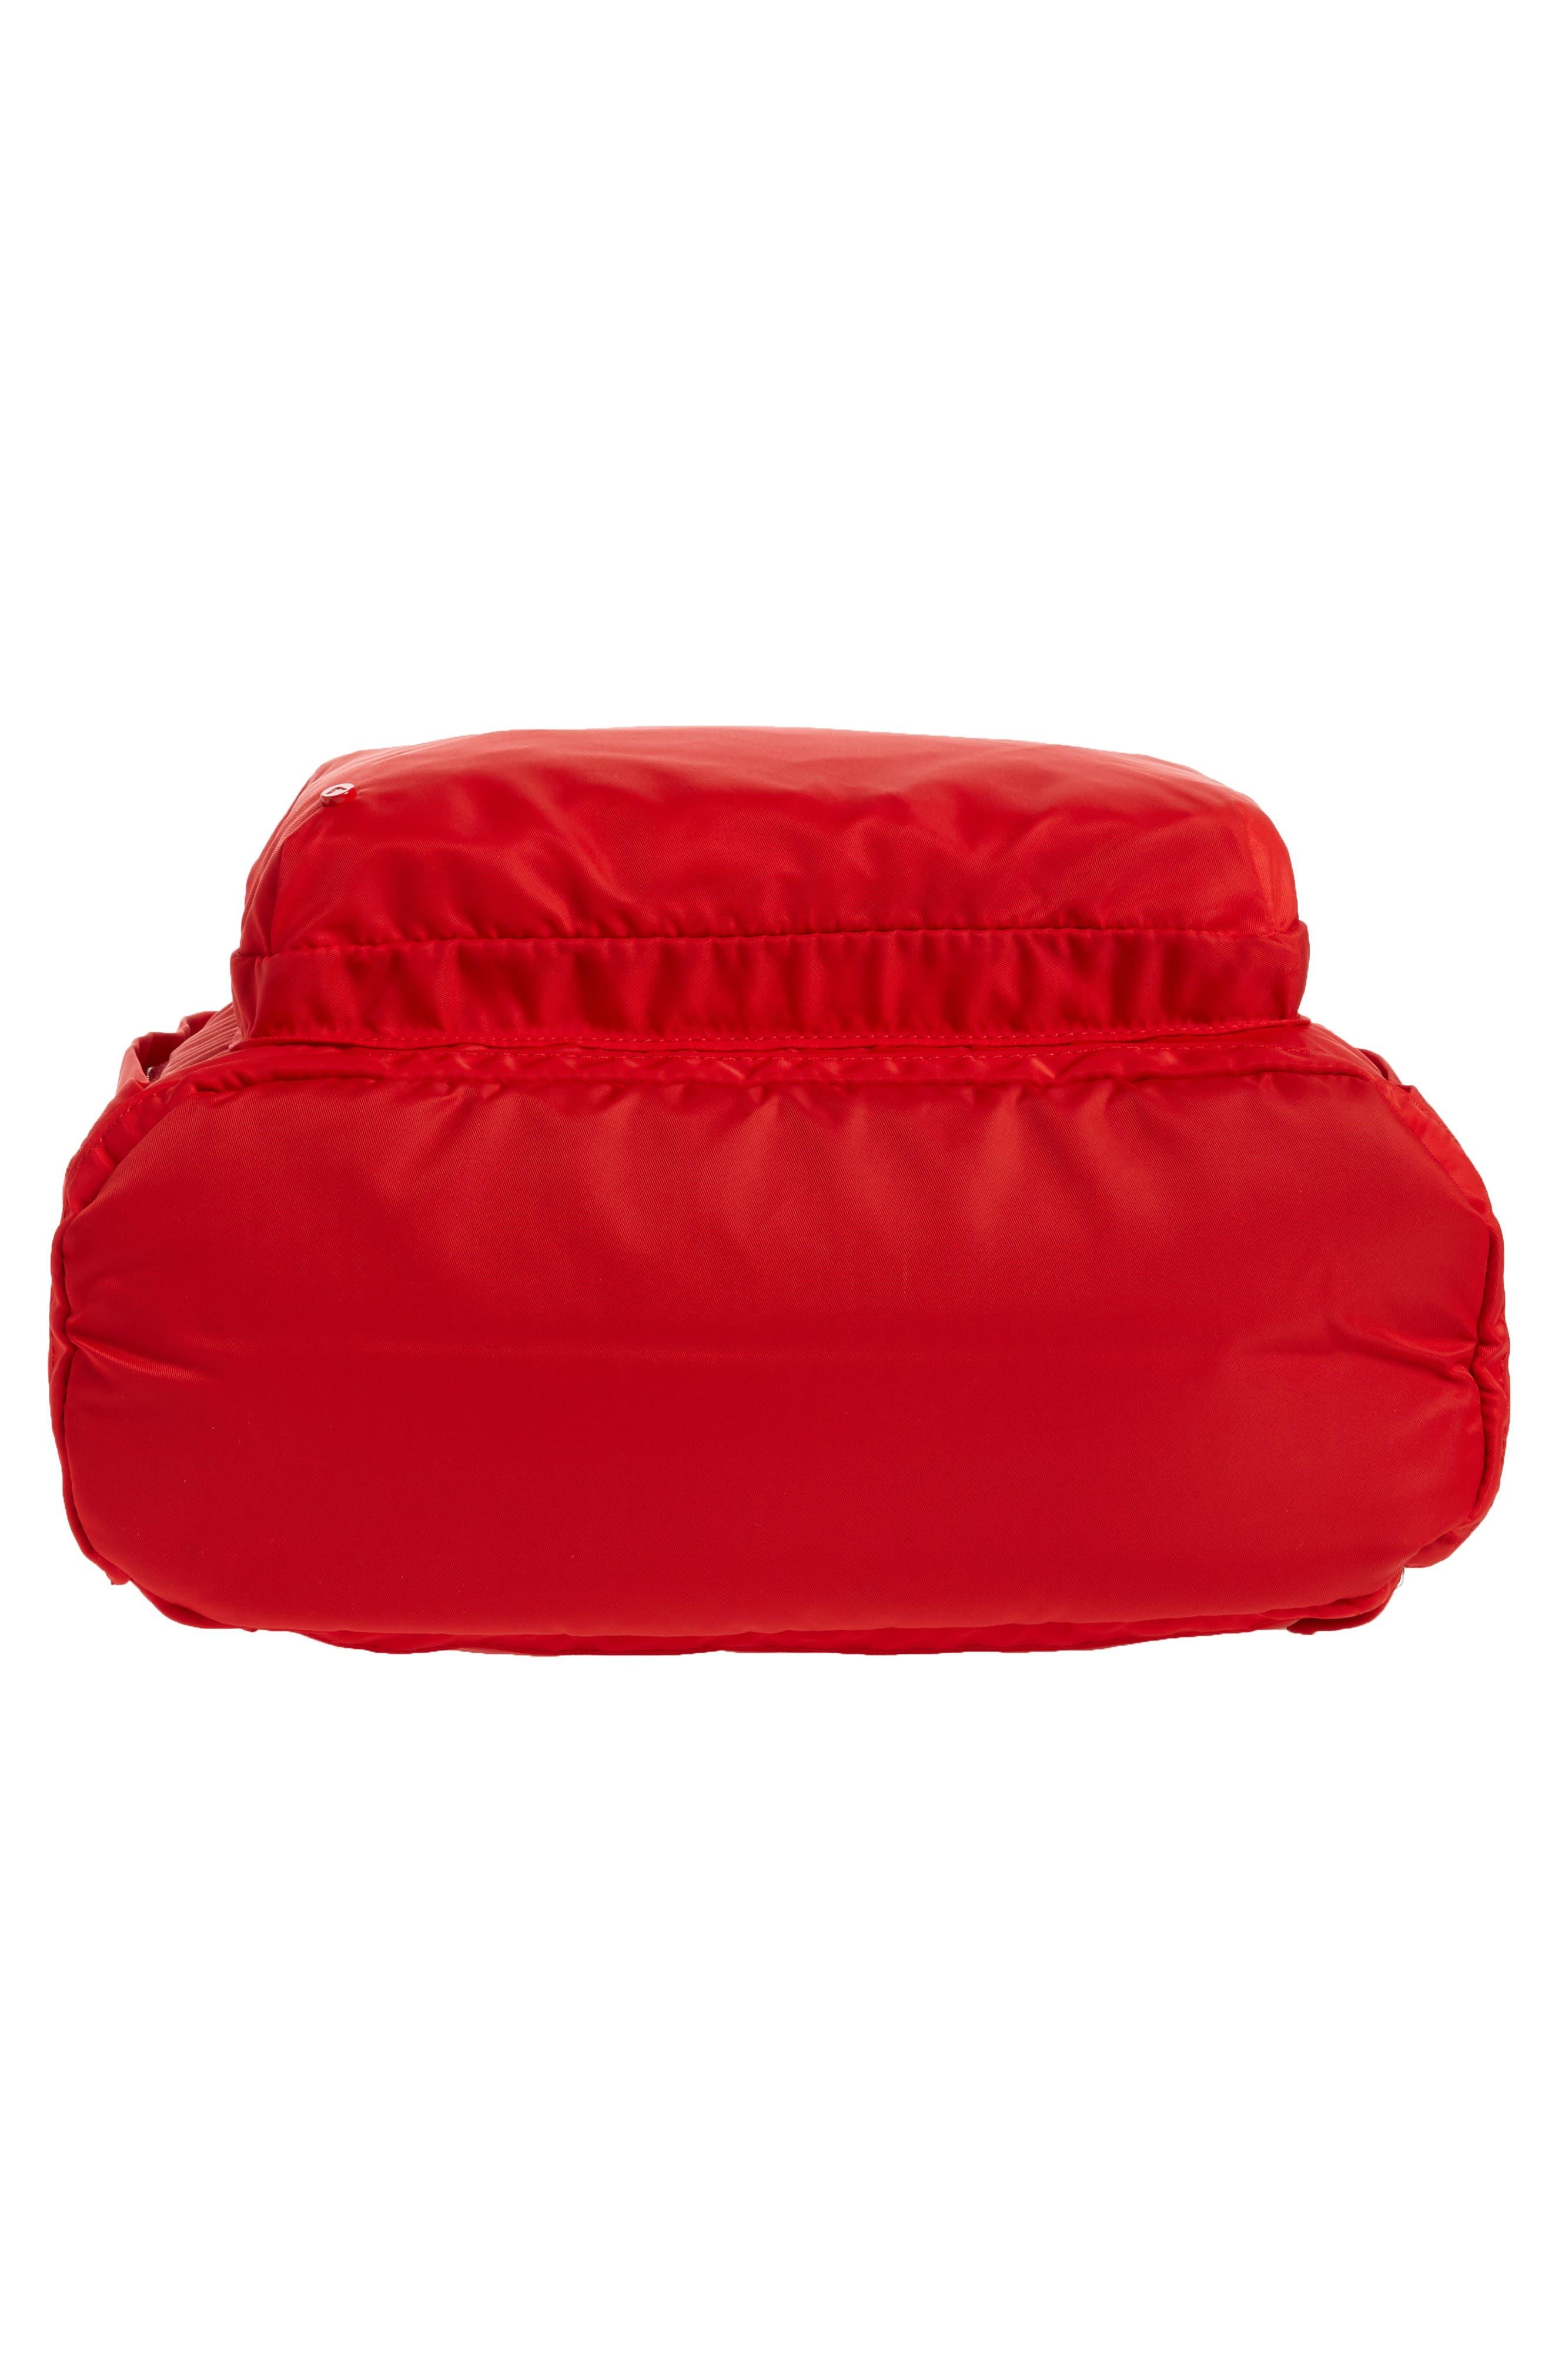 Heights Lorimer Nylon Backpack,                             Alternate thumbnail 6, color,                             RED